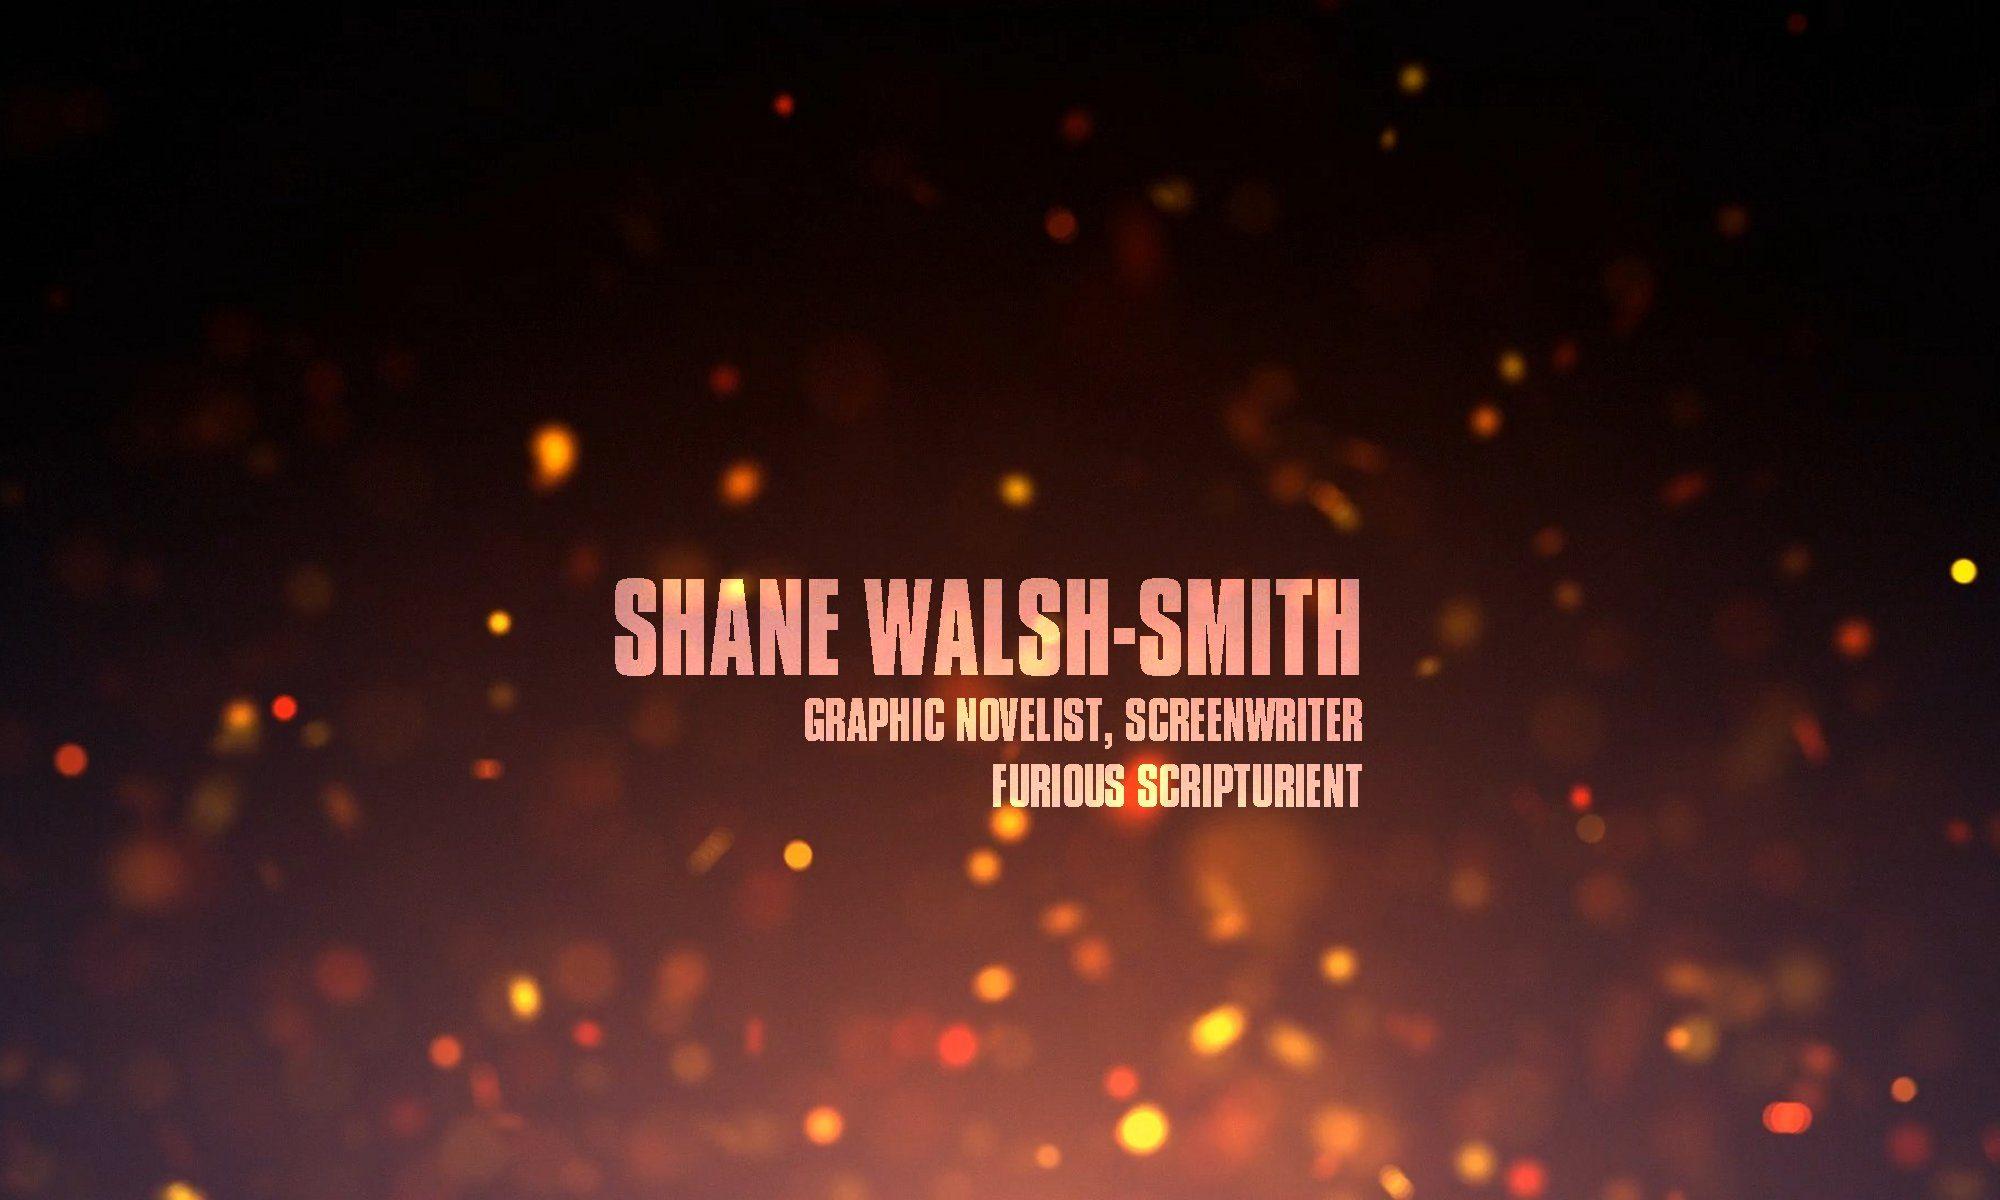 Shane Walsh-Smith